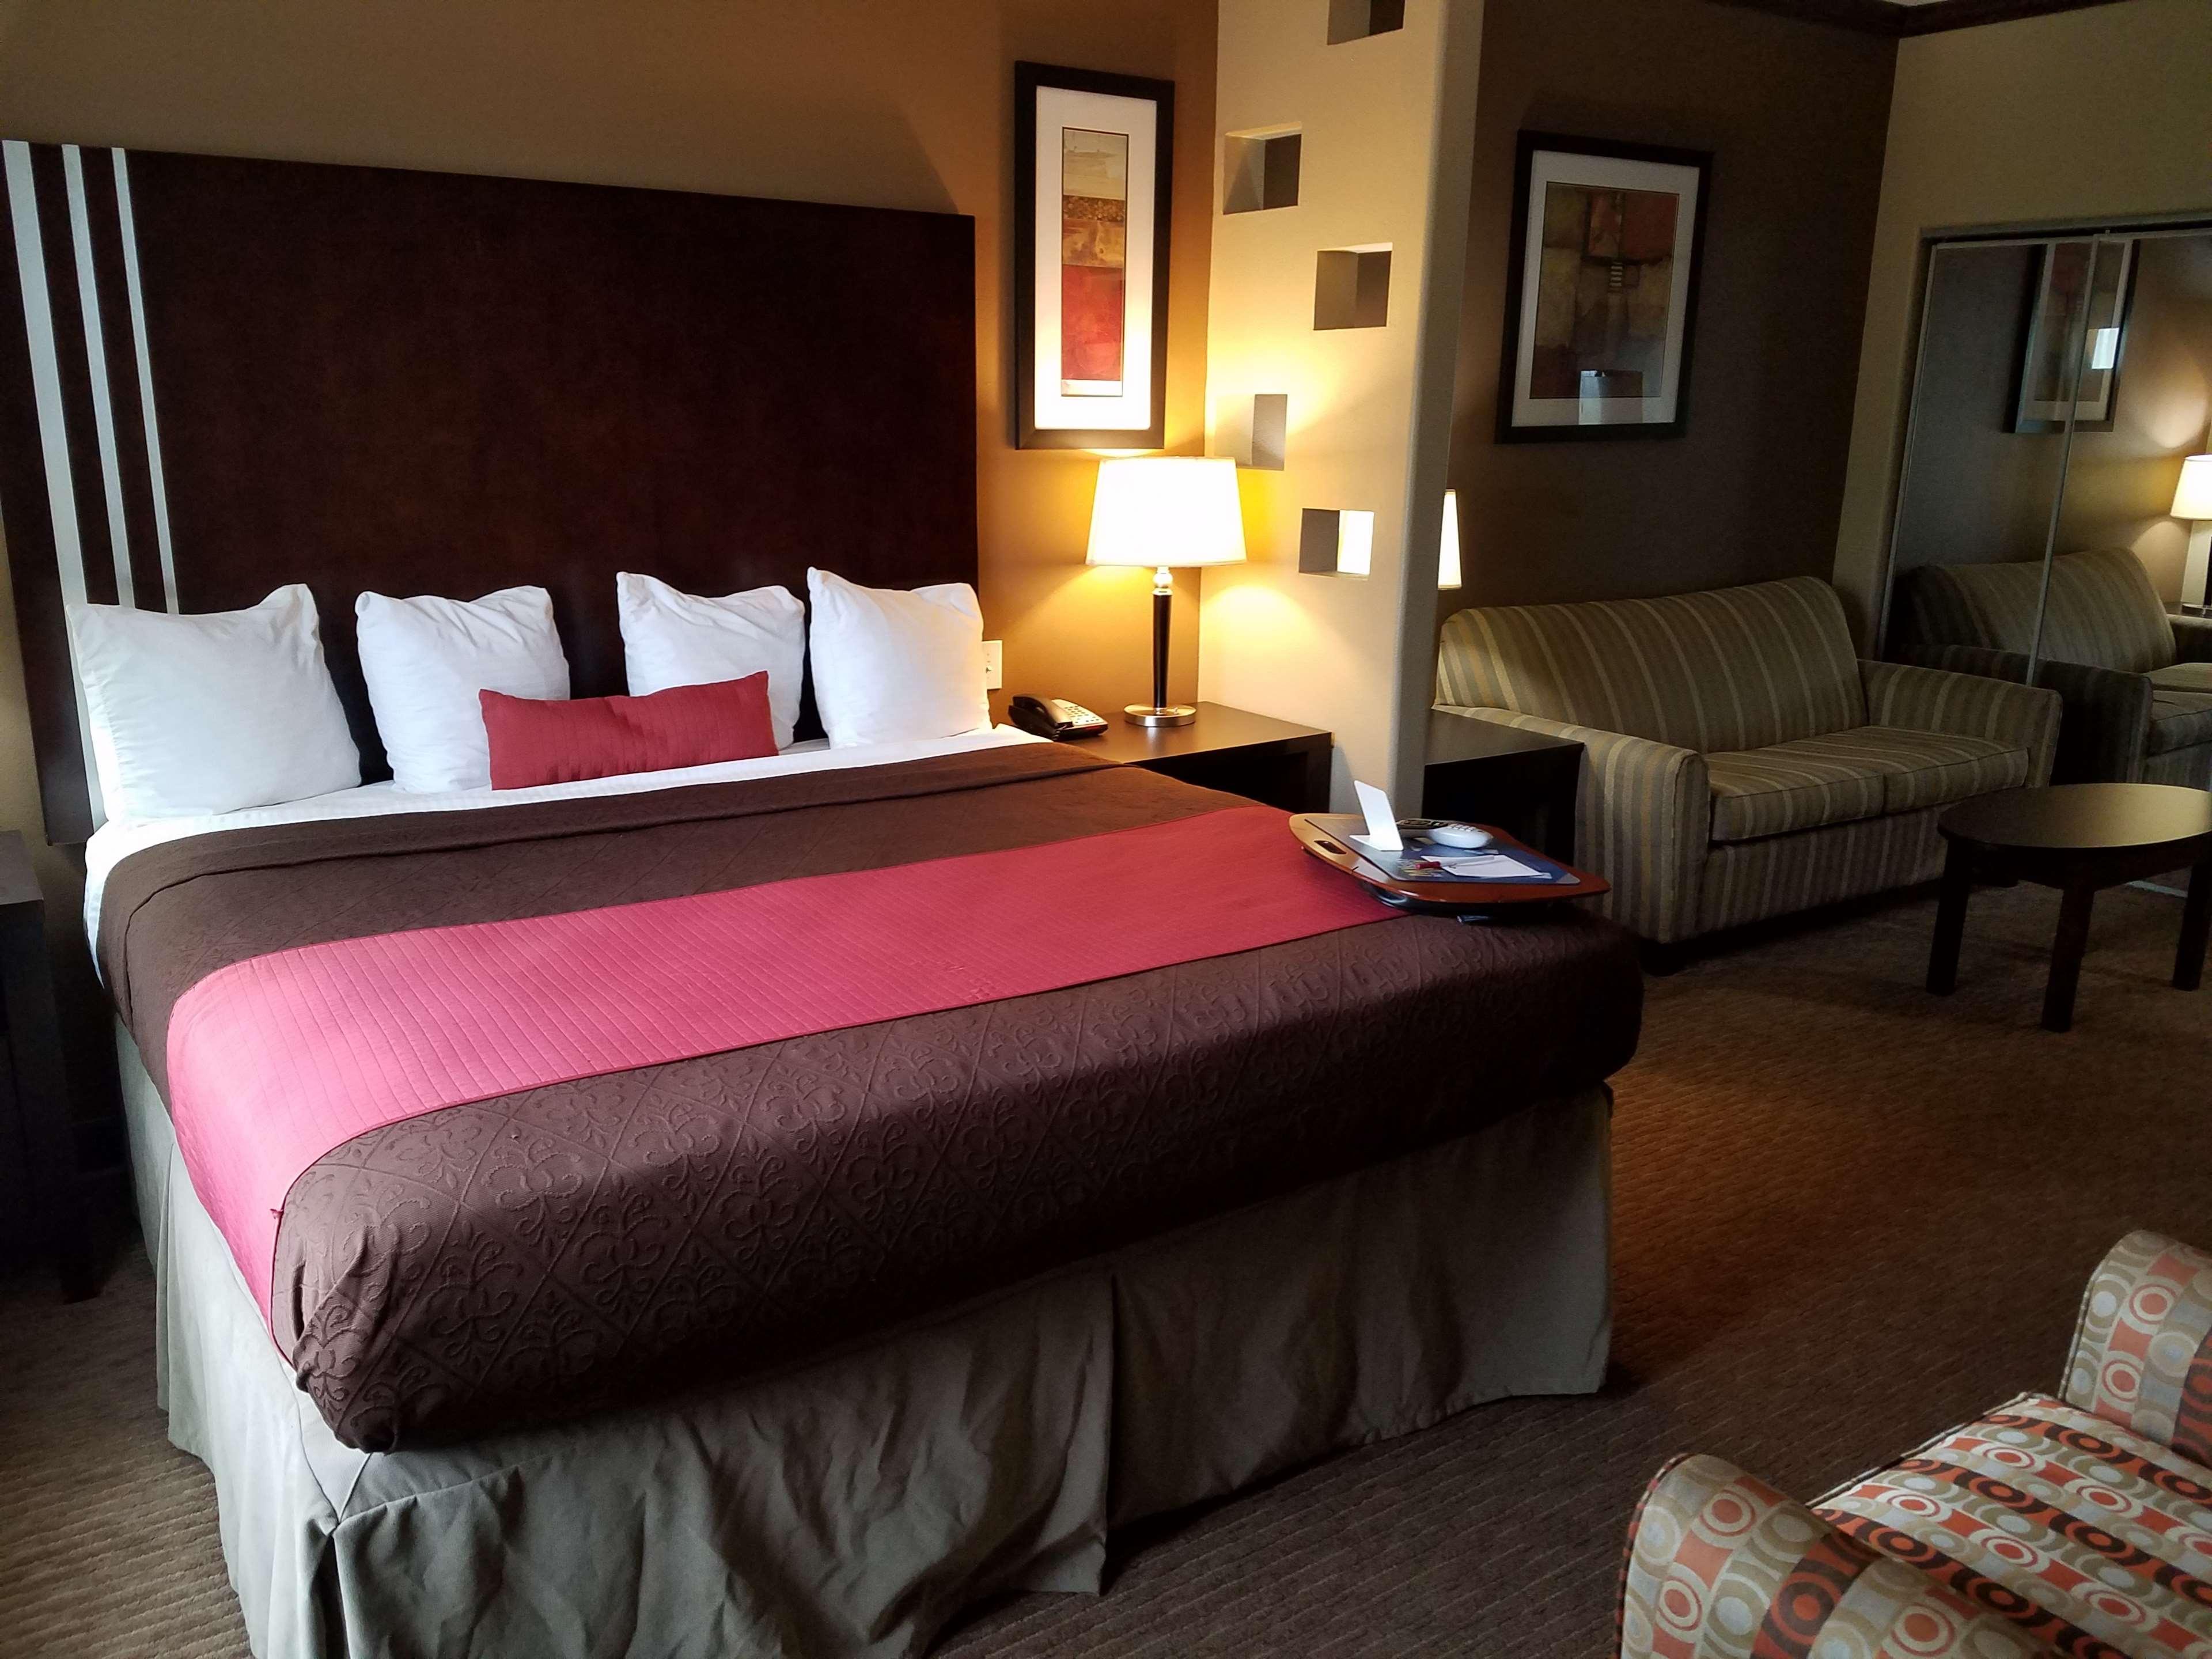 Best Western Plus Texoma Hotel & Suites image 38